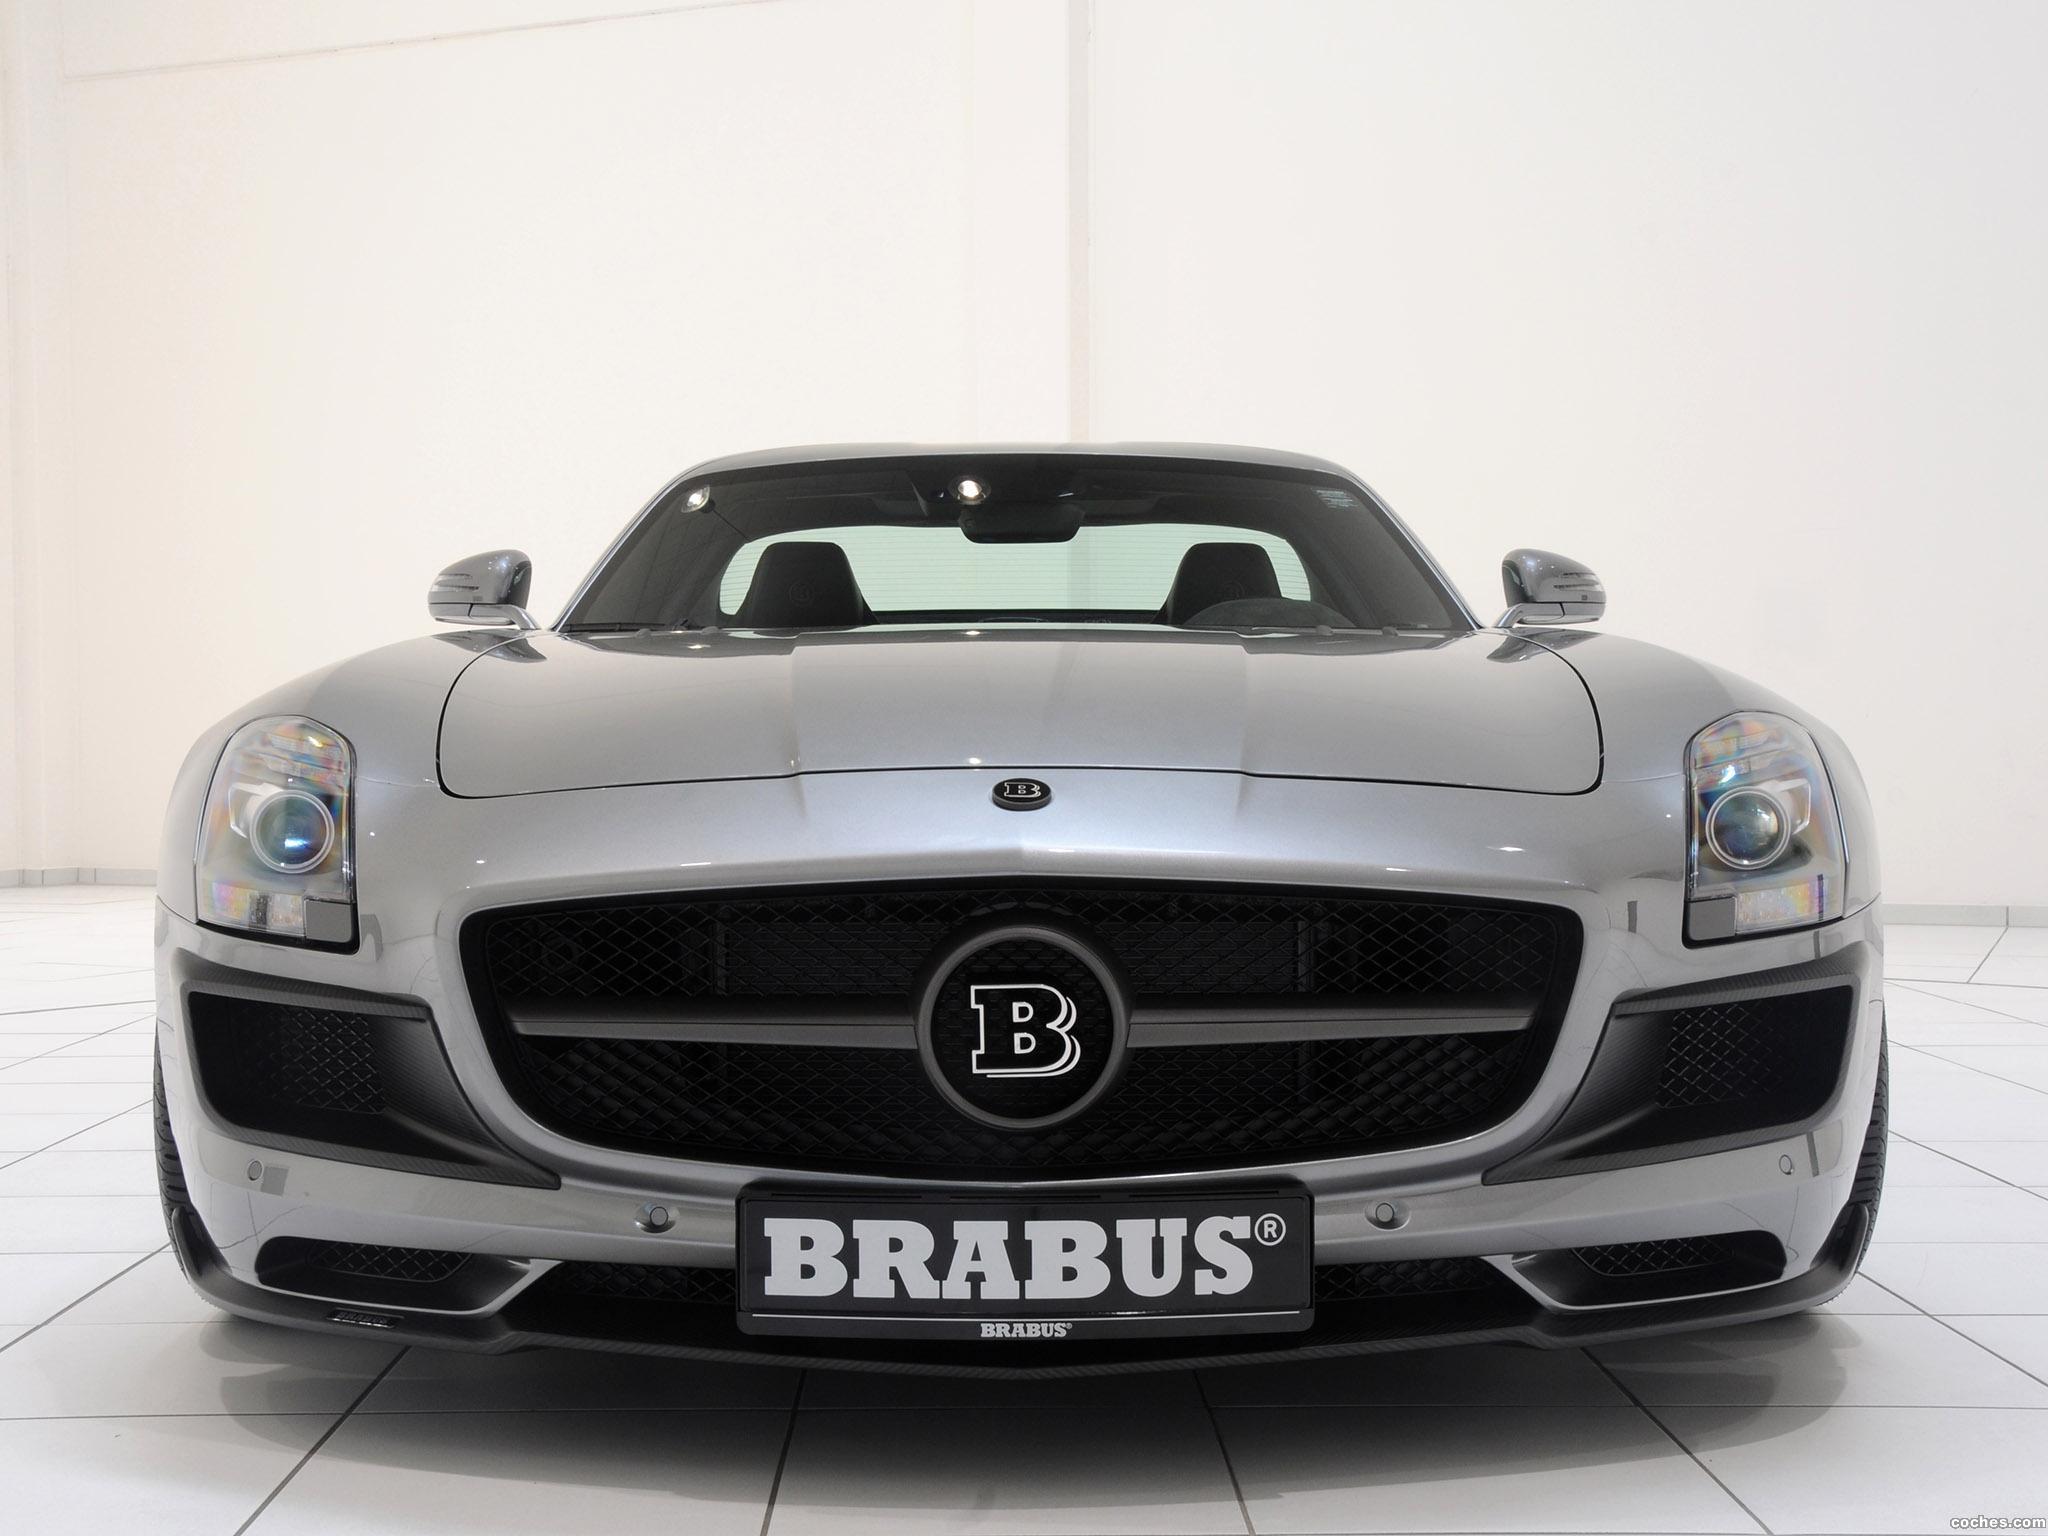 Foto 7 de Mercedes brabus 700 Biturbo 2011